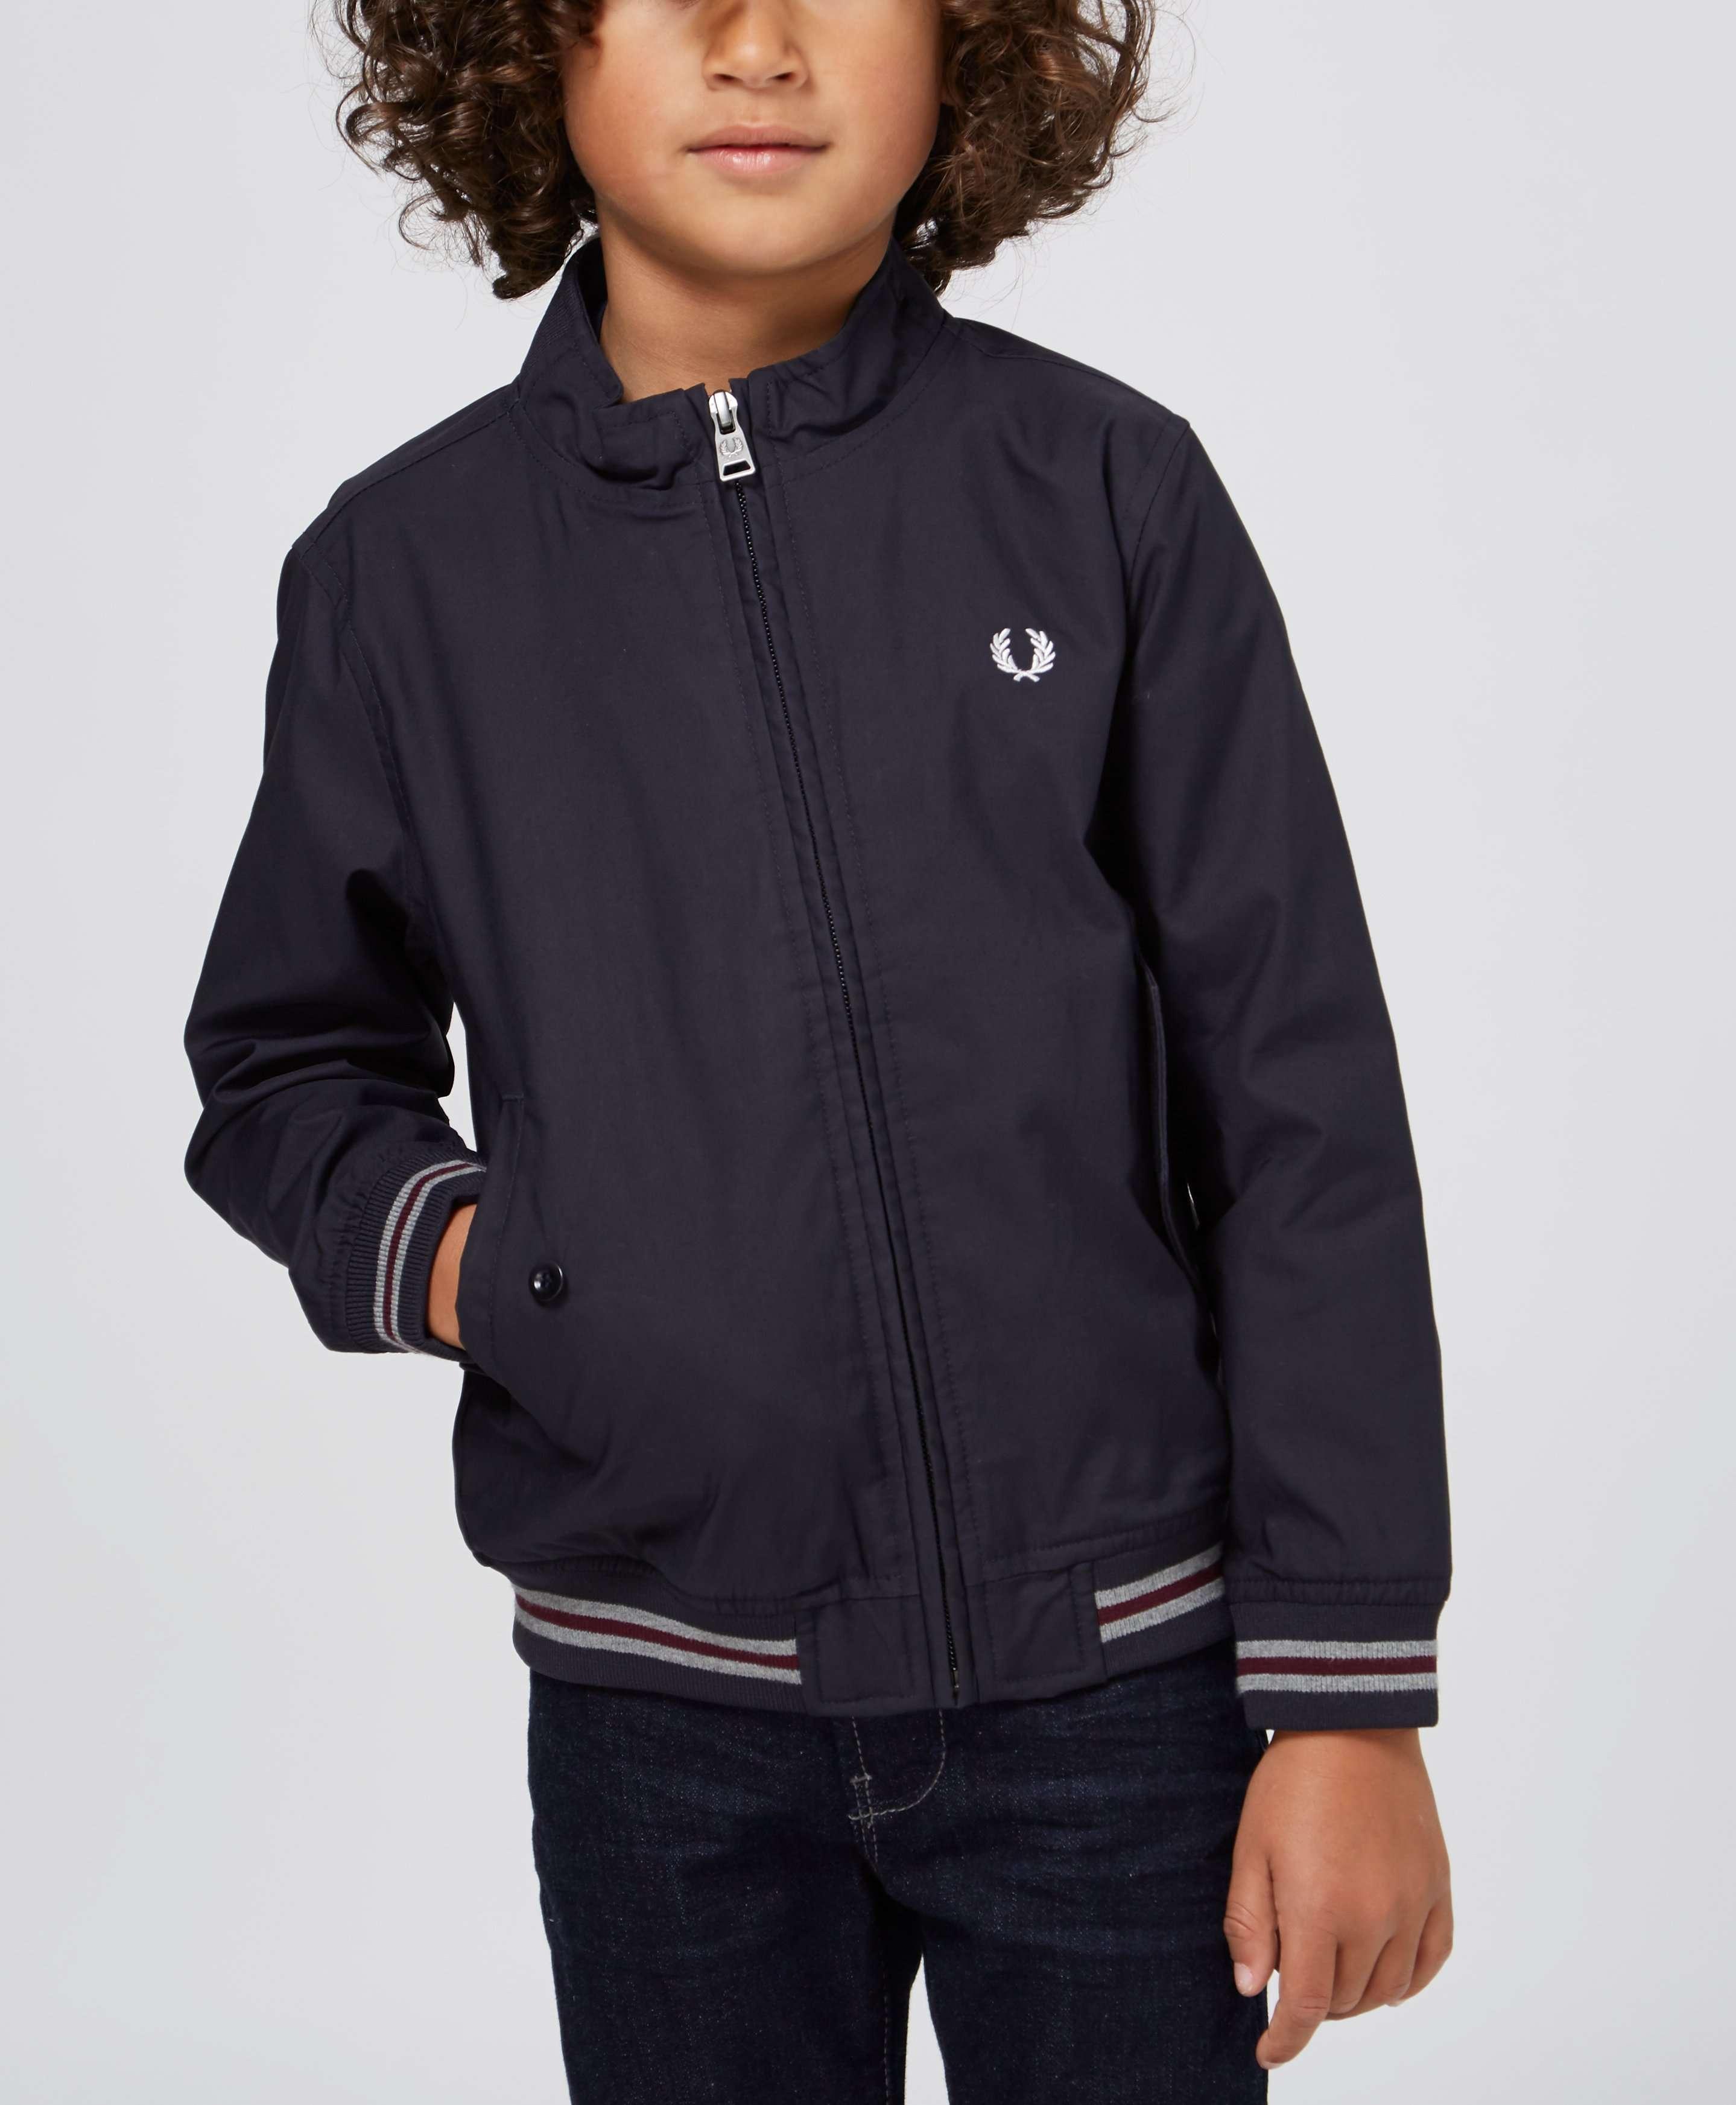 Fred Perry Childrens Harrington Jacket Scotts Menswear